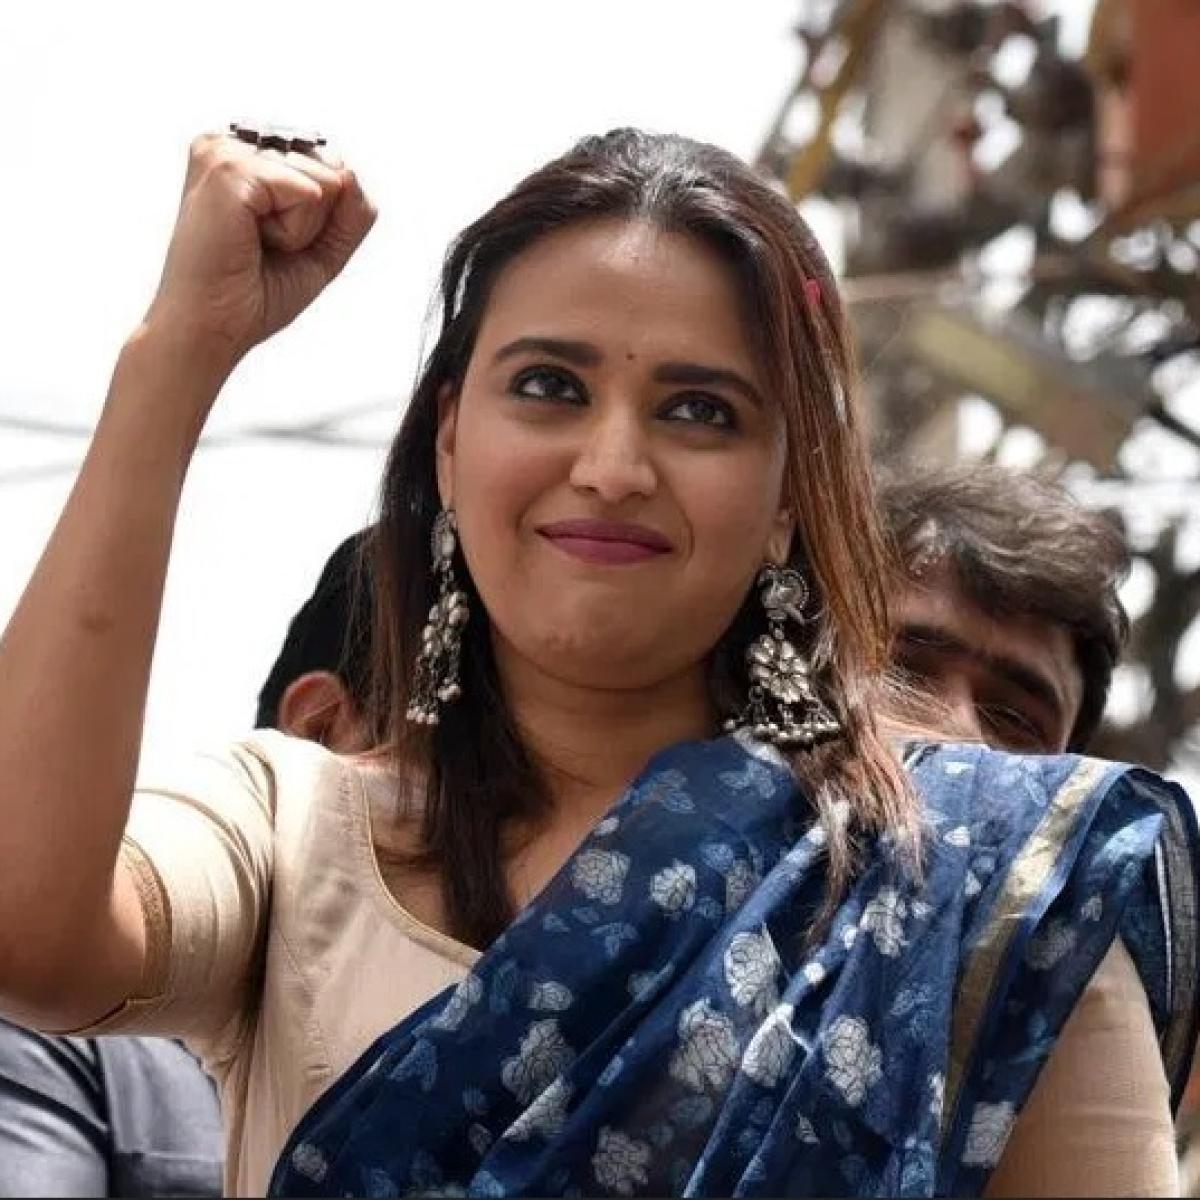 Swara Bhaskar takes her identity as an actress seriously